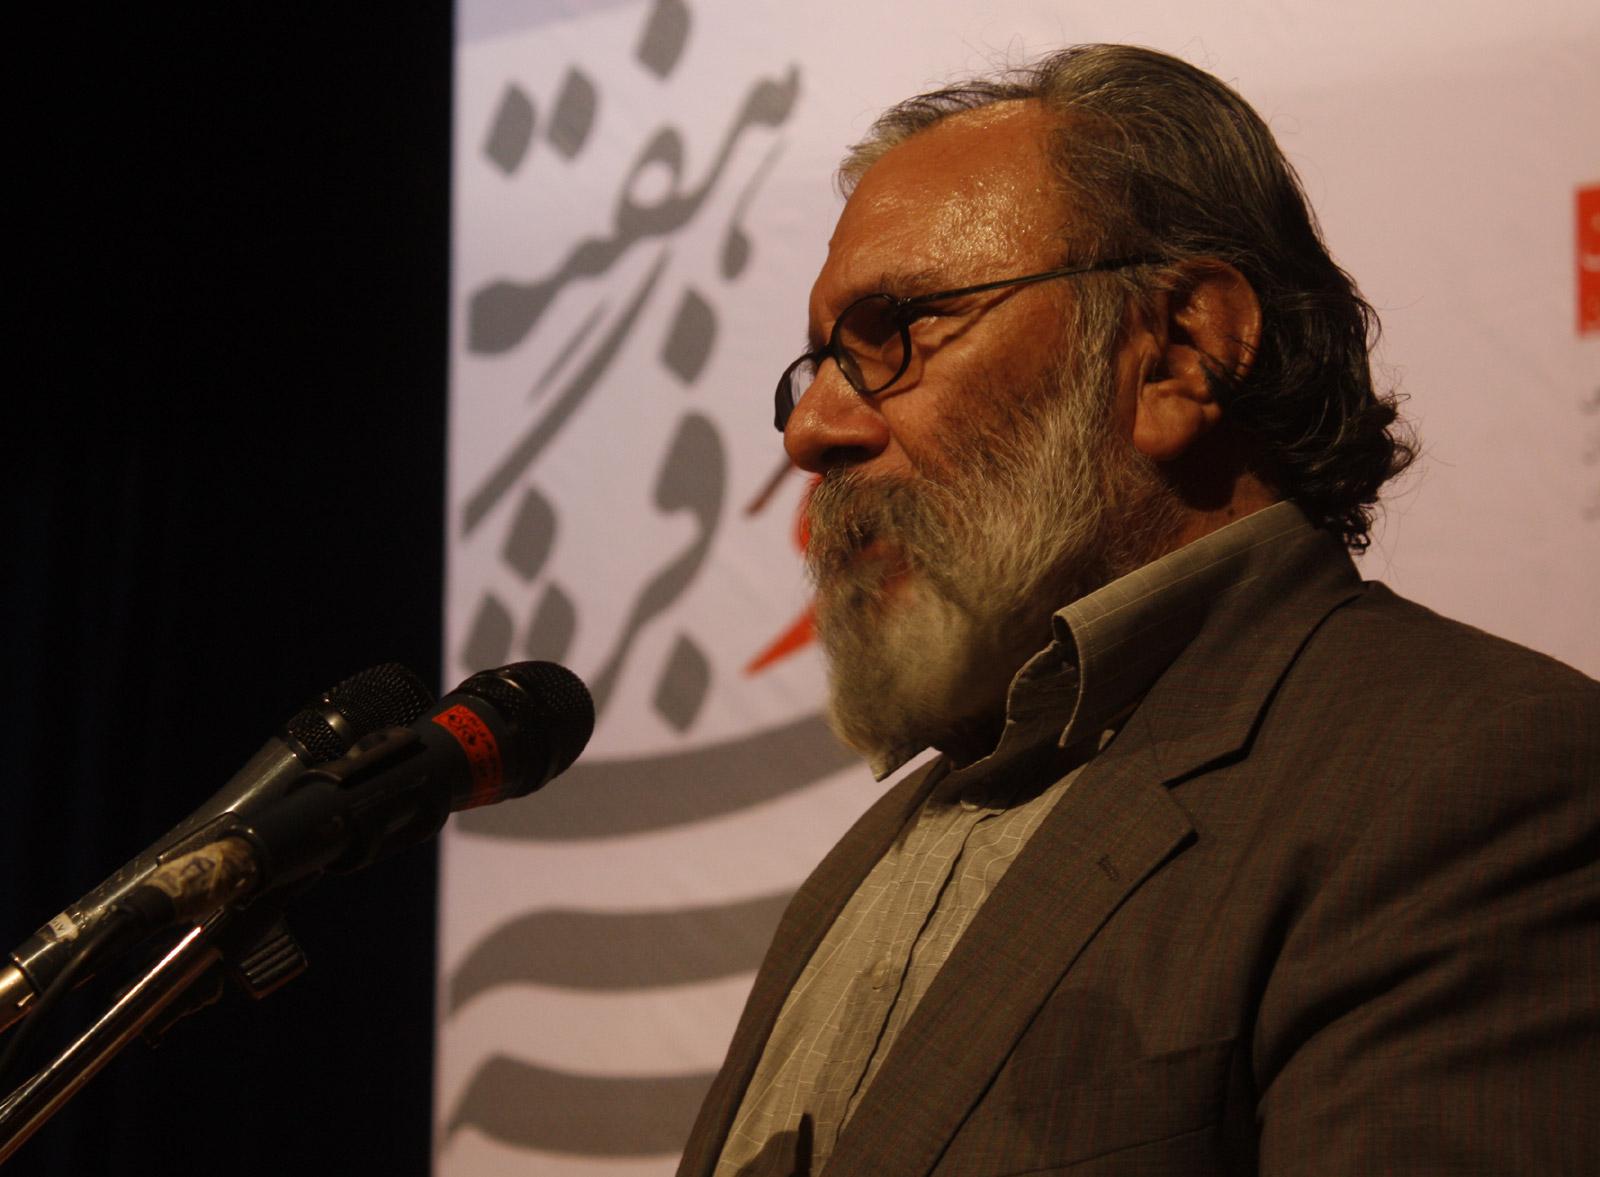 http://upload.wikimedia.org/wikipedia/commons/2/23/Moalem_Damghani_-_Semnan_Cultural_Week.jpg